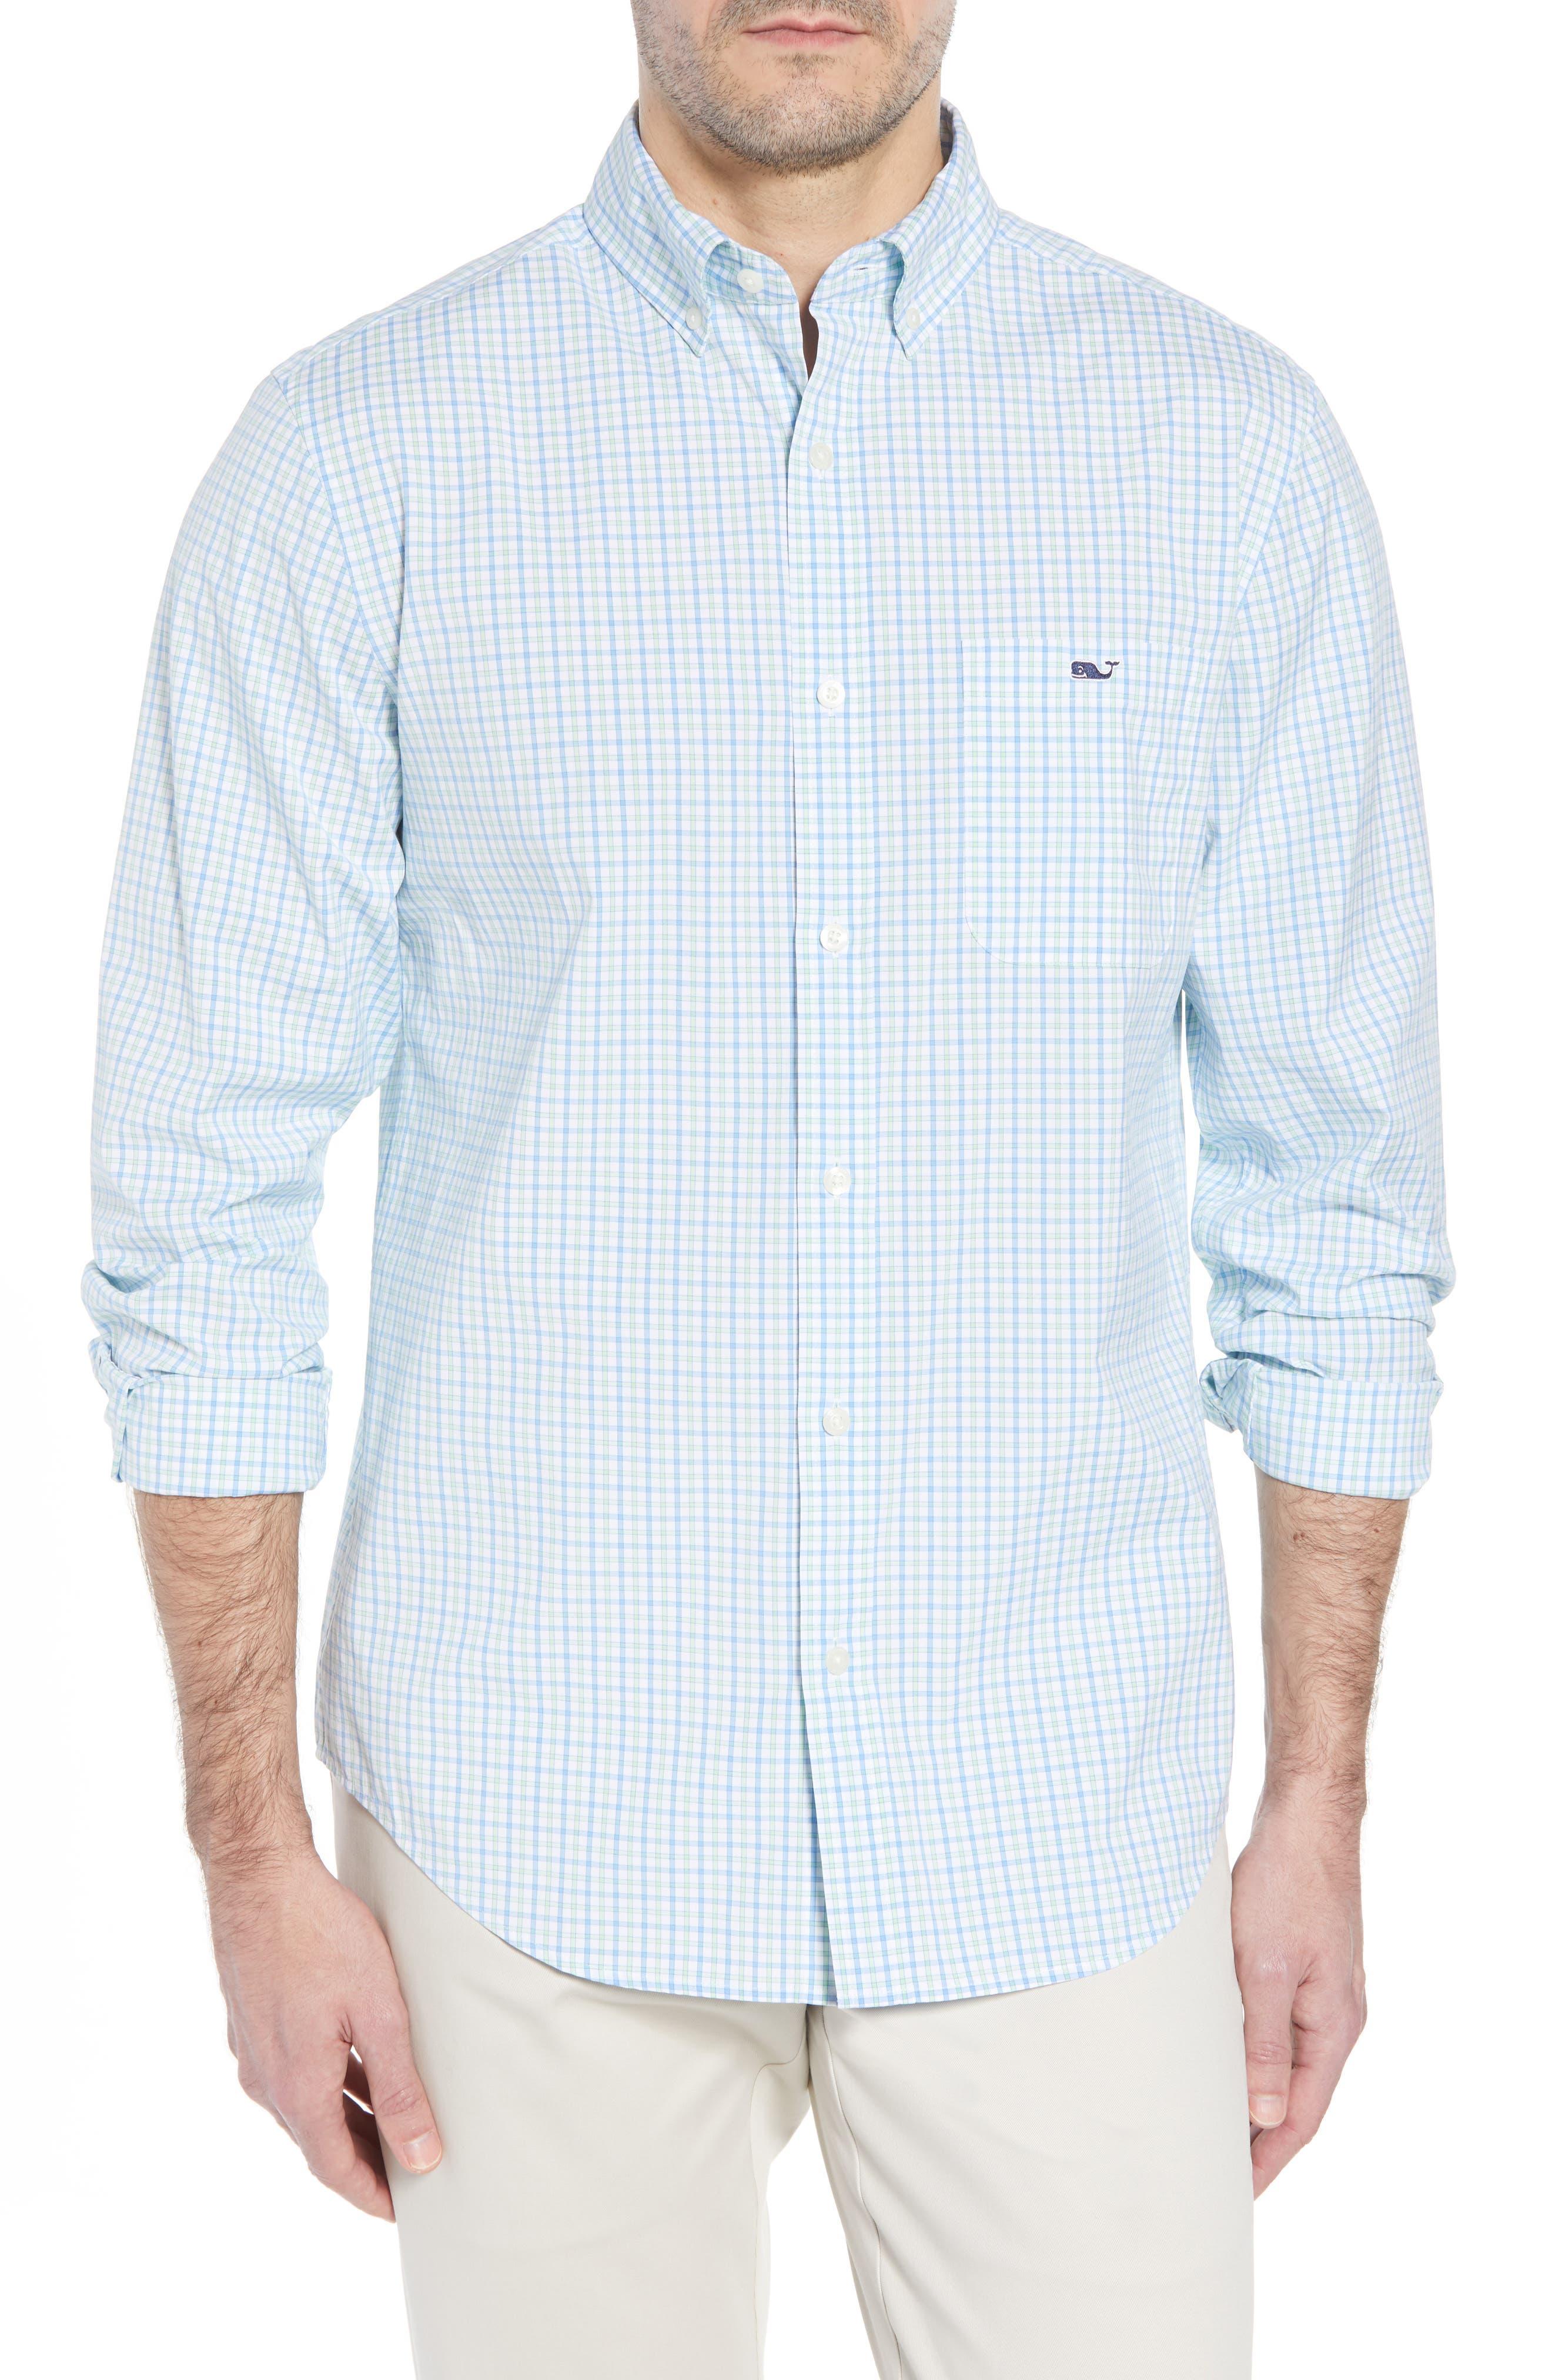 Clark Cove Tucker Classic Fit Check Sport Shirt,                             Main thumbnail 1, color,                             305